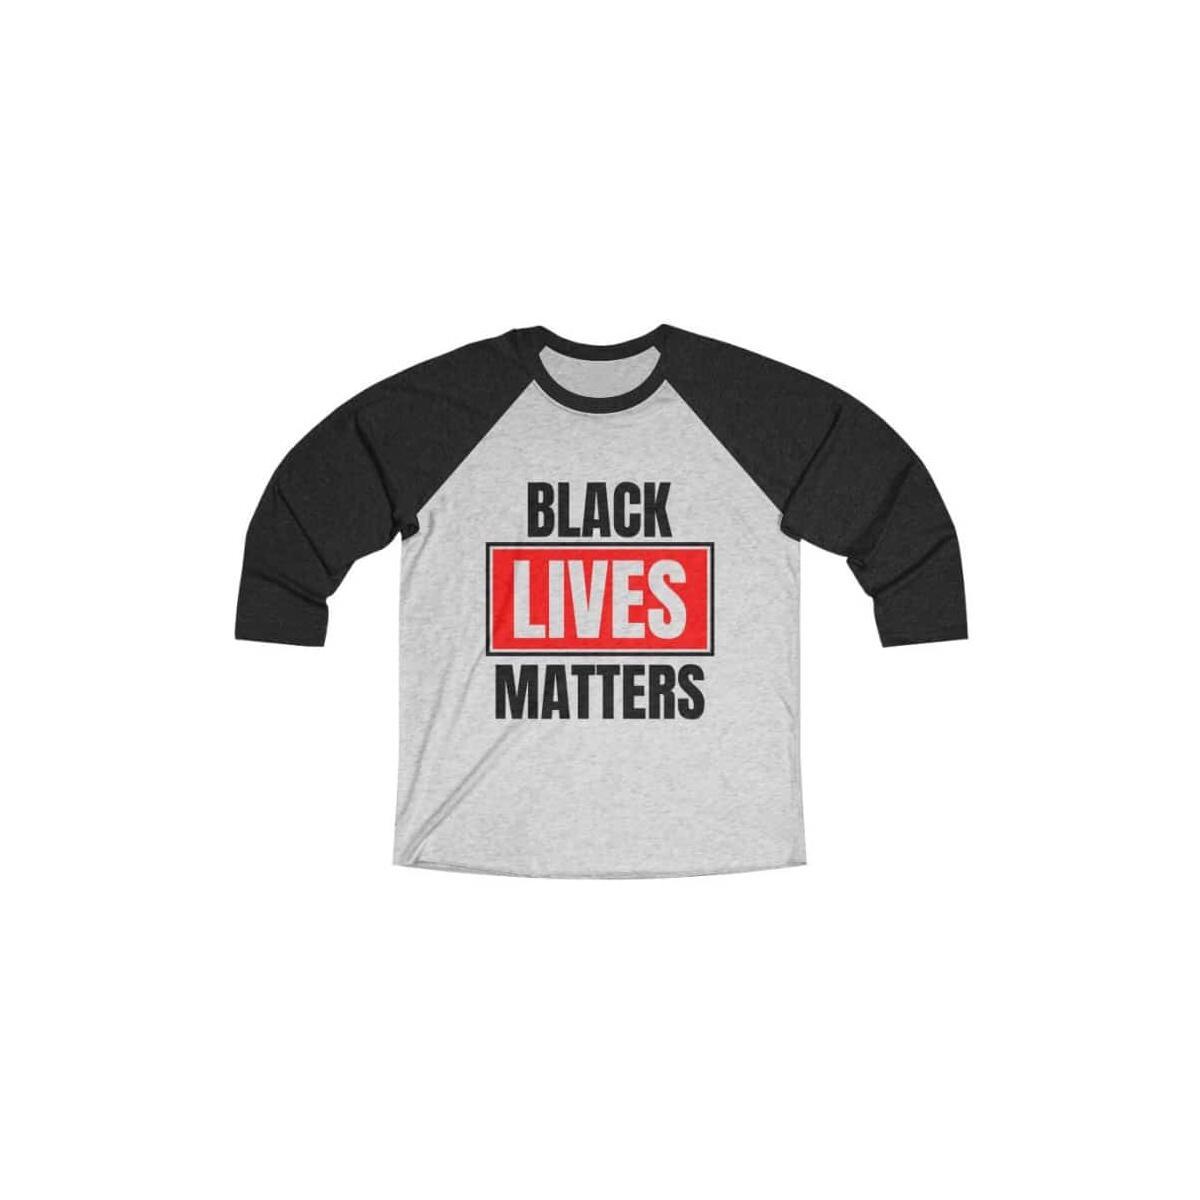 Afrocentric Black Lives Matters Tri-Blend Raglan Tee, Vintage Black / Heather White / M